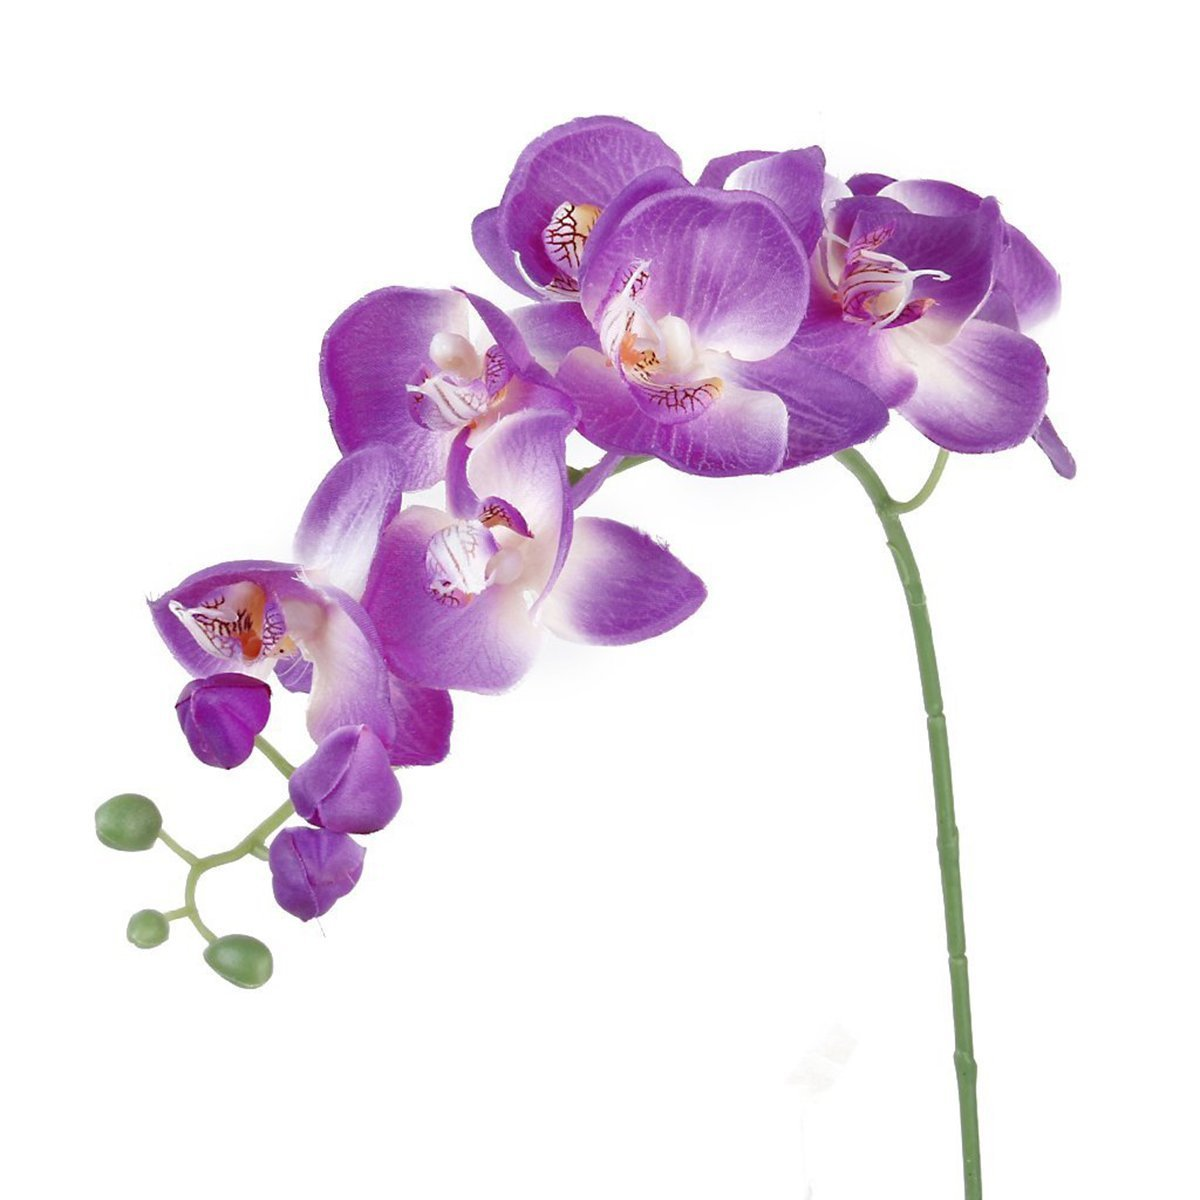 UEETEK Simulation Butterfly Orchid Artificial Flower Plant Home Decoration (Purple)